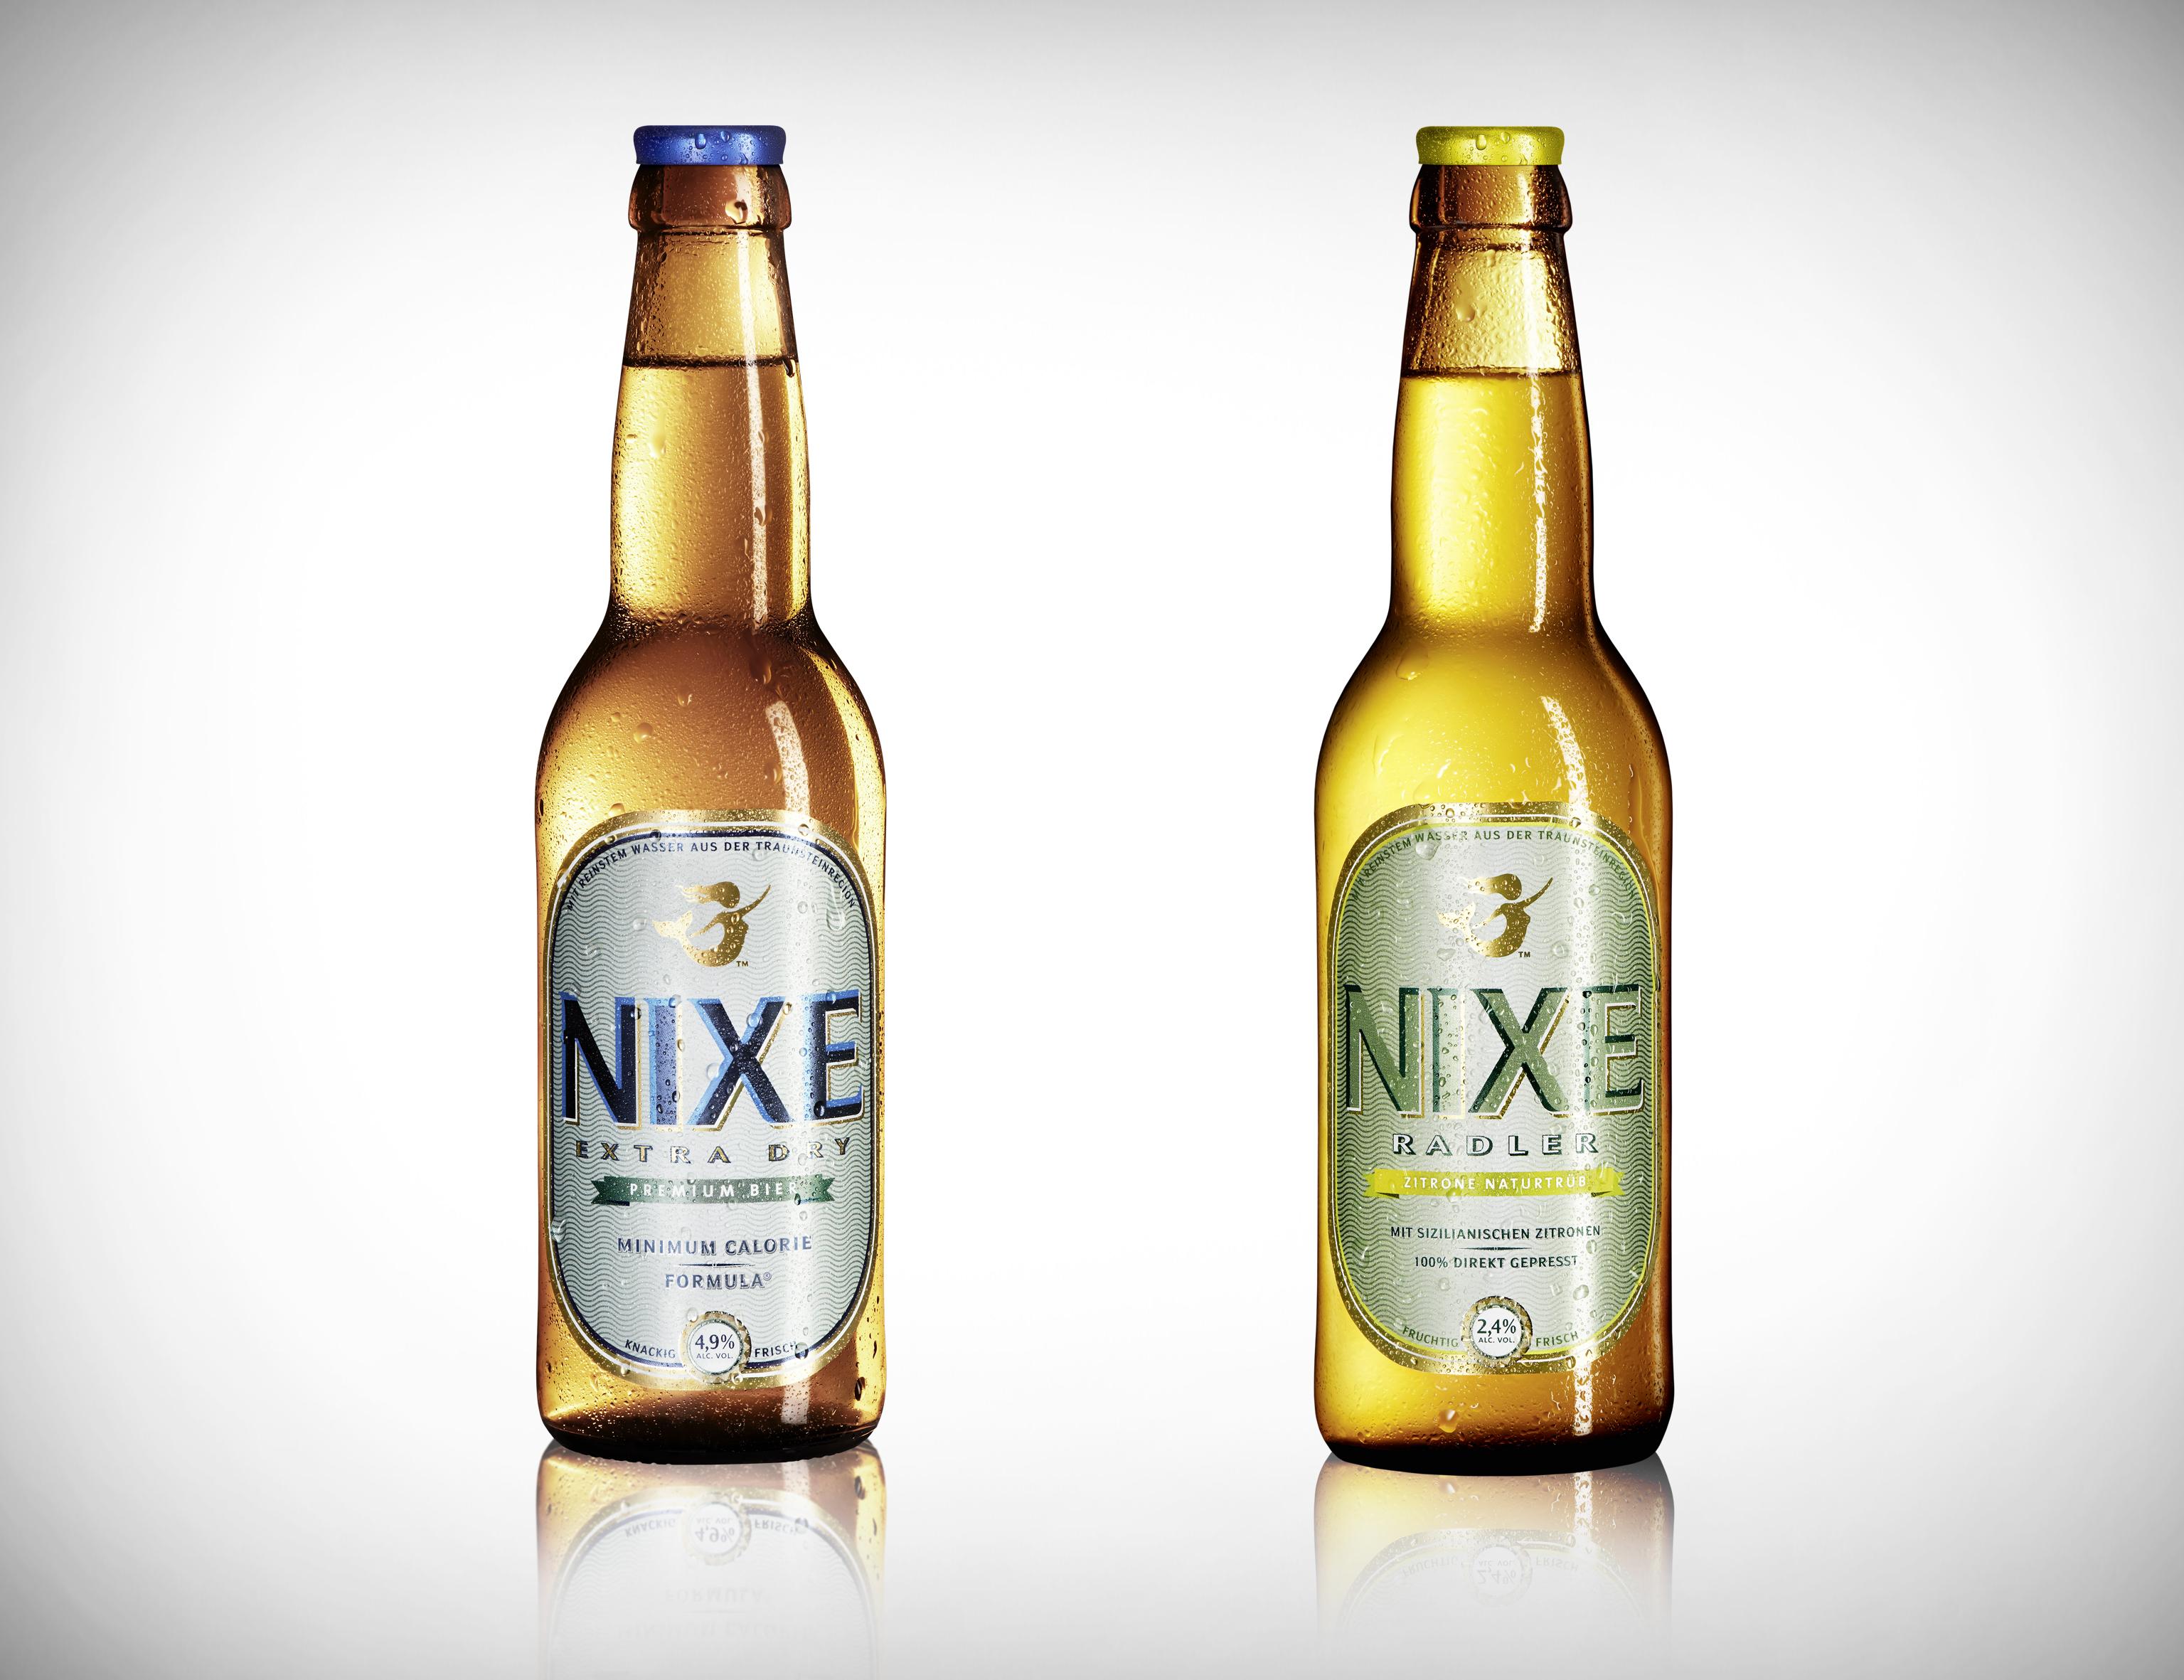 NIXE u Radler